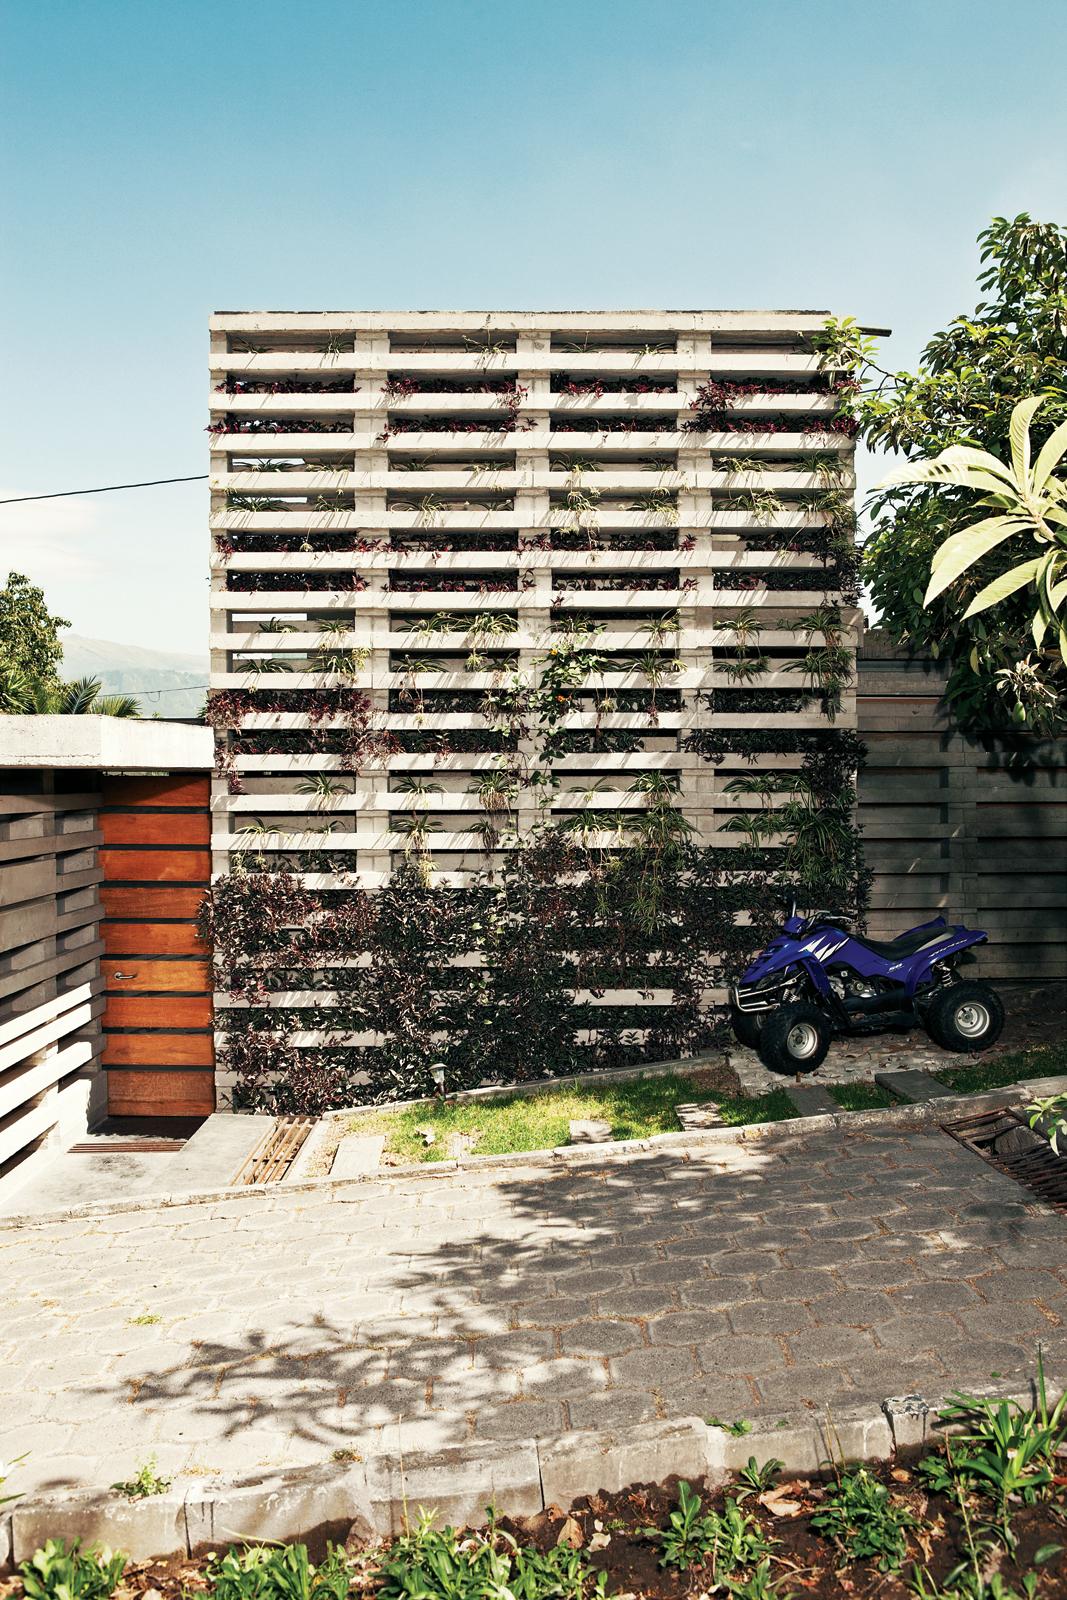 Modular building system designed by Jose Maria Saez and Daviad Barragan